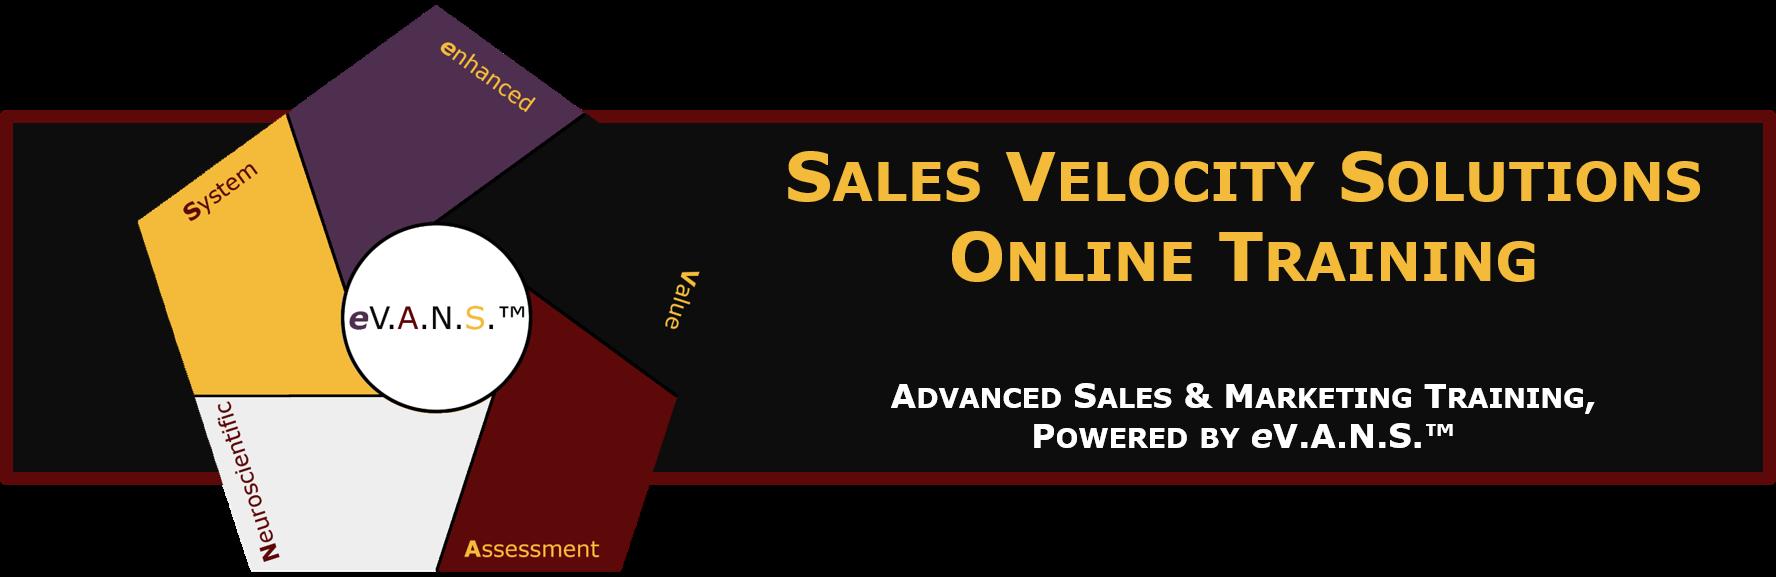 Sales Velocity Solutions Online Training Platform